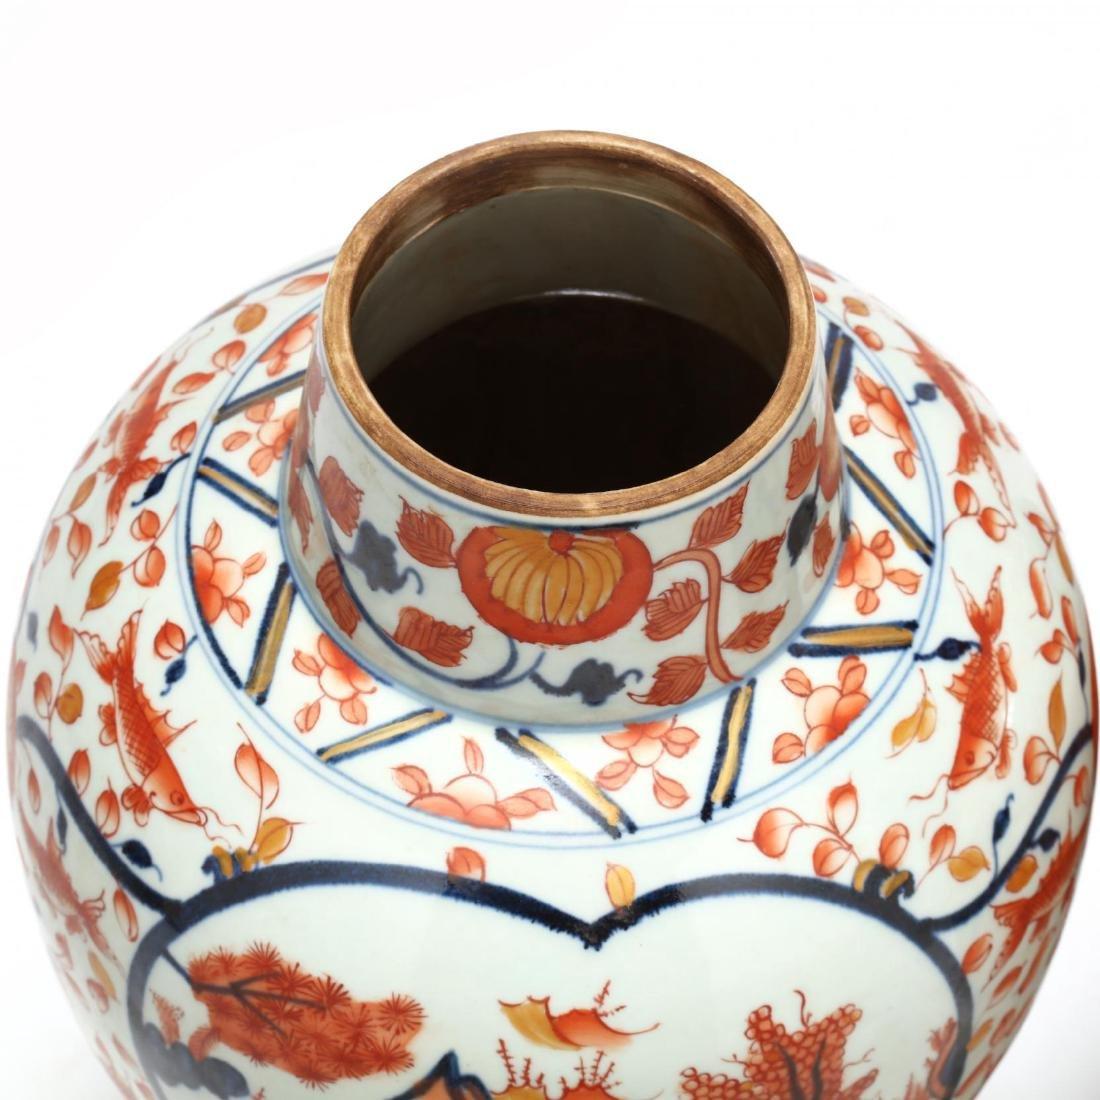 A Pair of Japanese Imari Covered Jars - 7